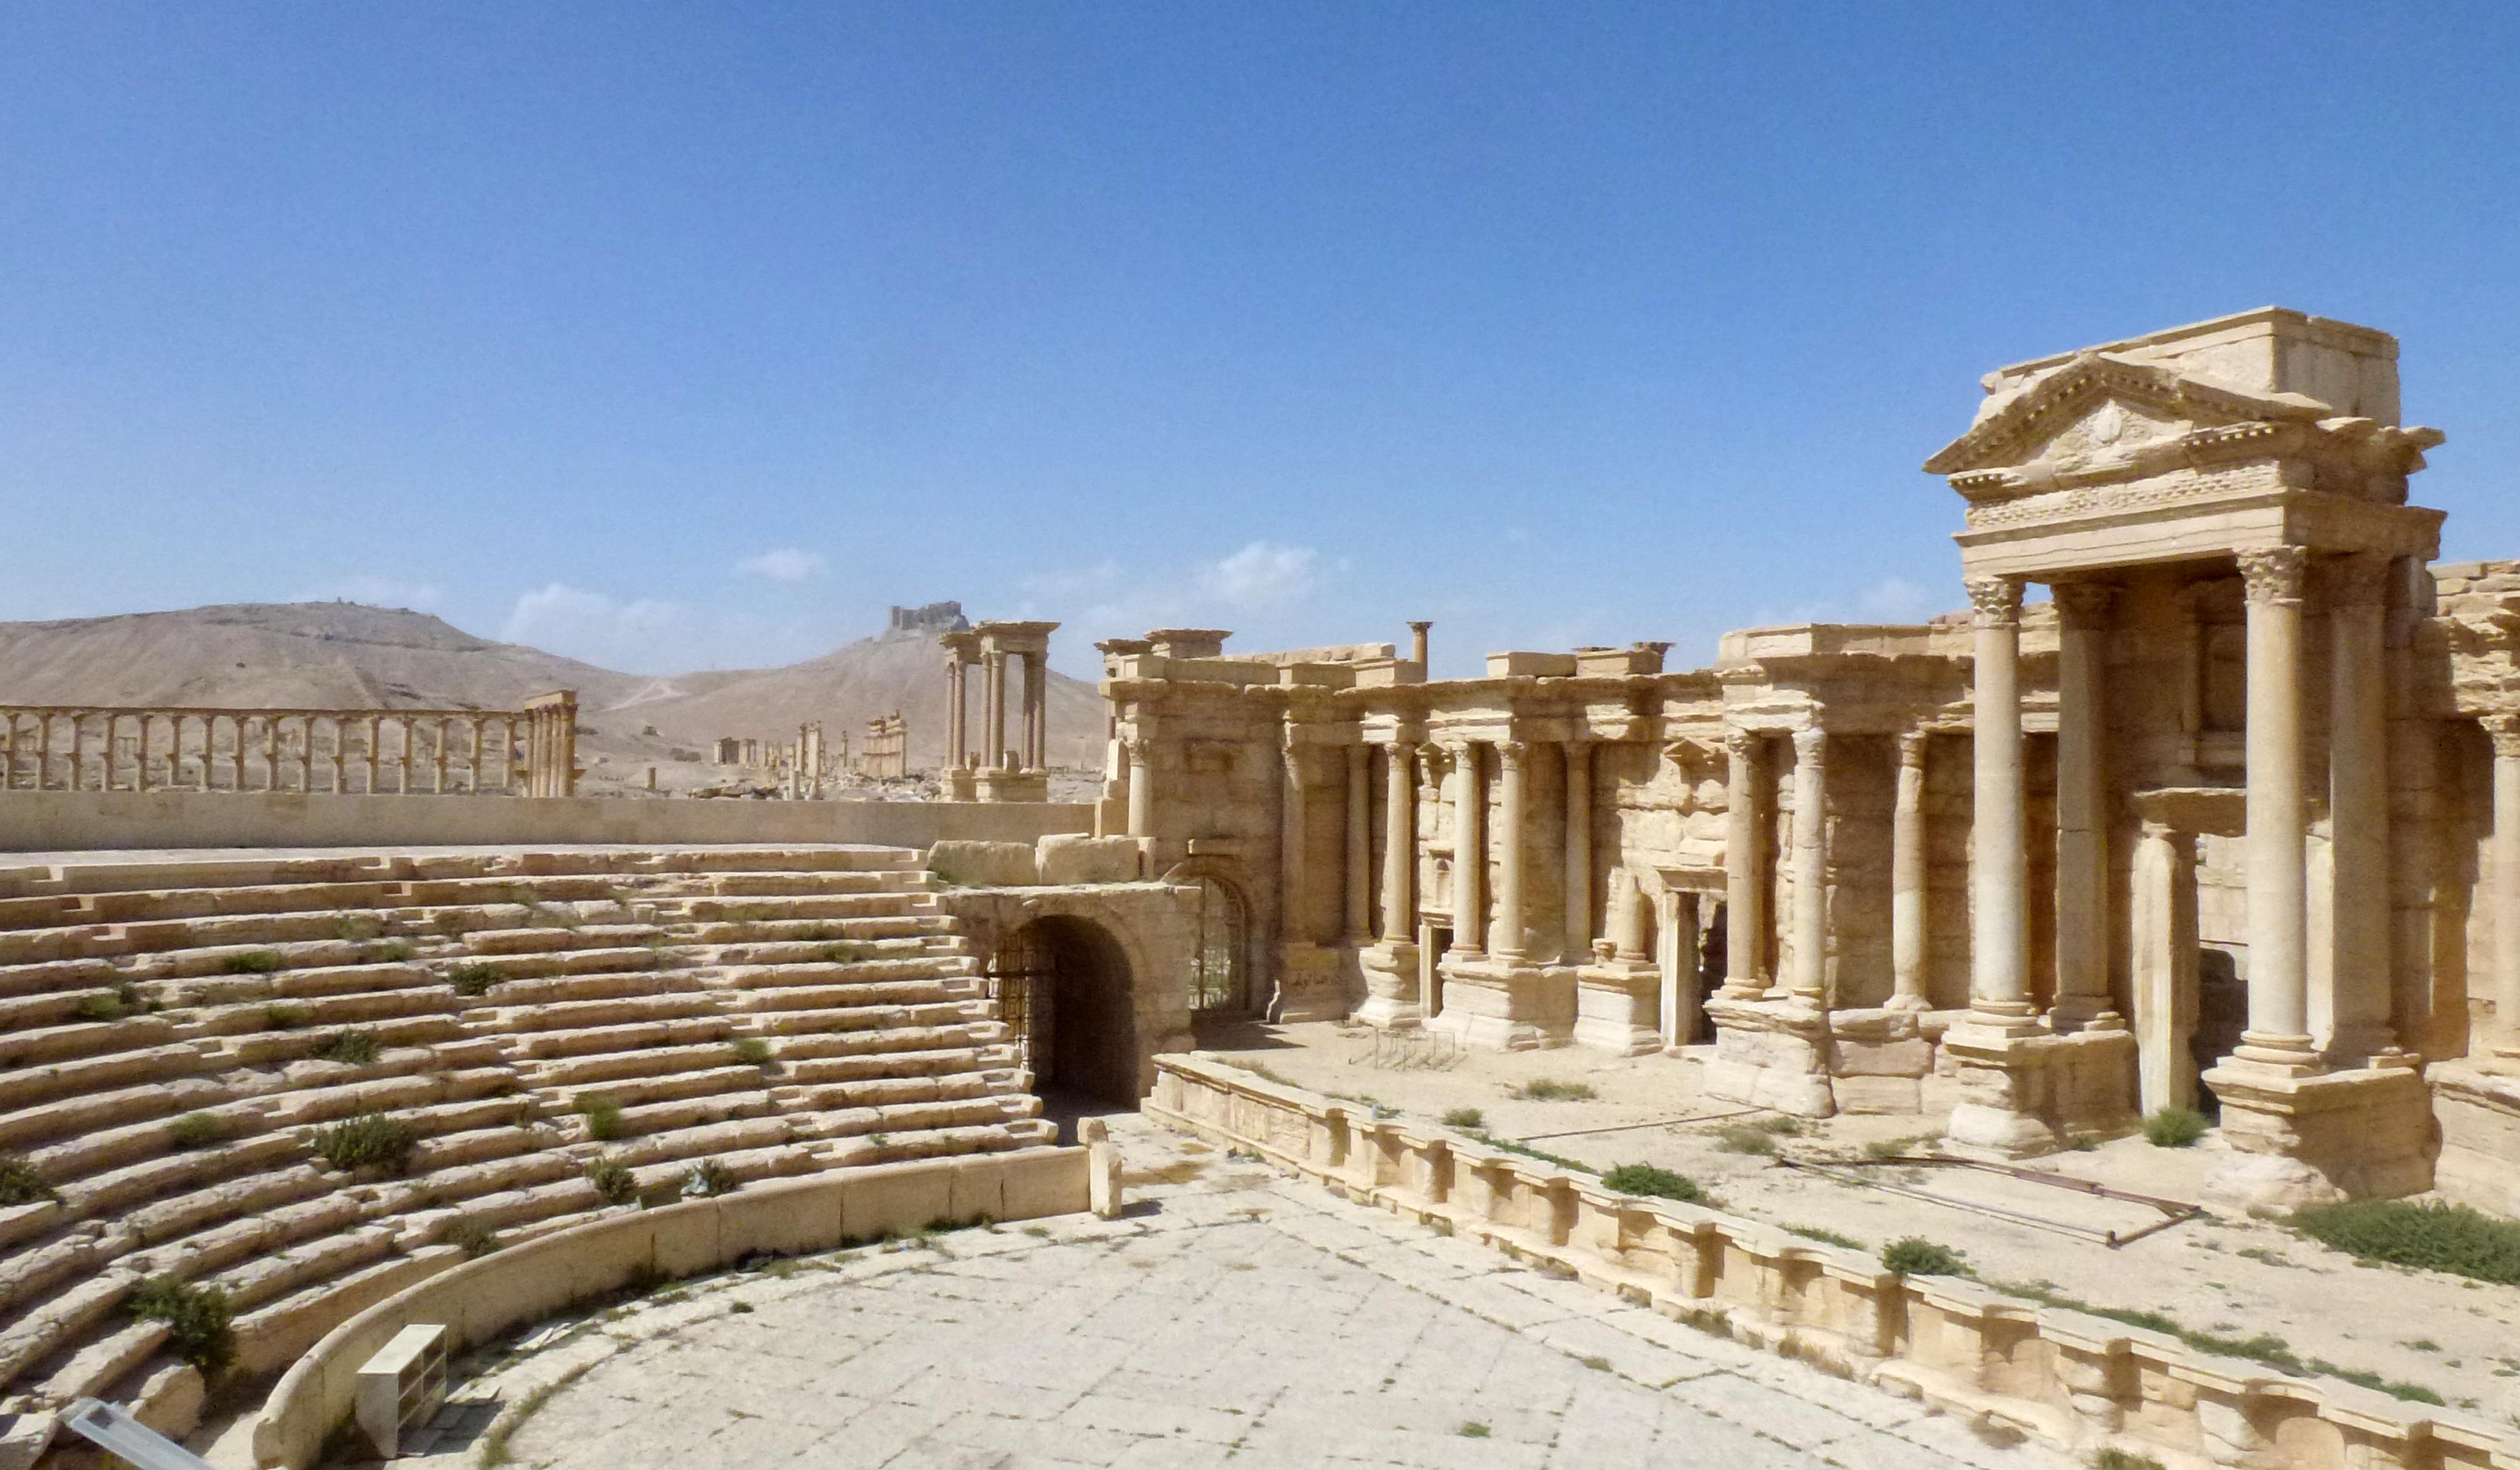 WEB PALMYRA SYRIA CONFLICT AMPHITHEATER ROMAN ©Maher AL MOUNES : AFP AI